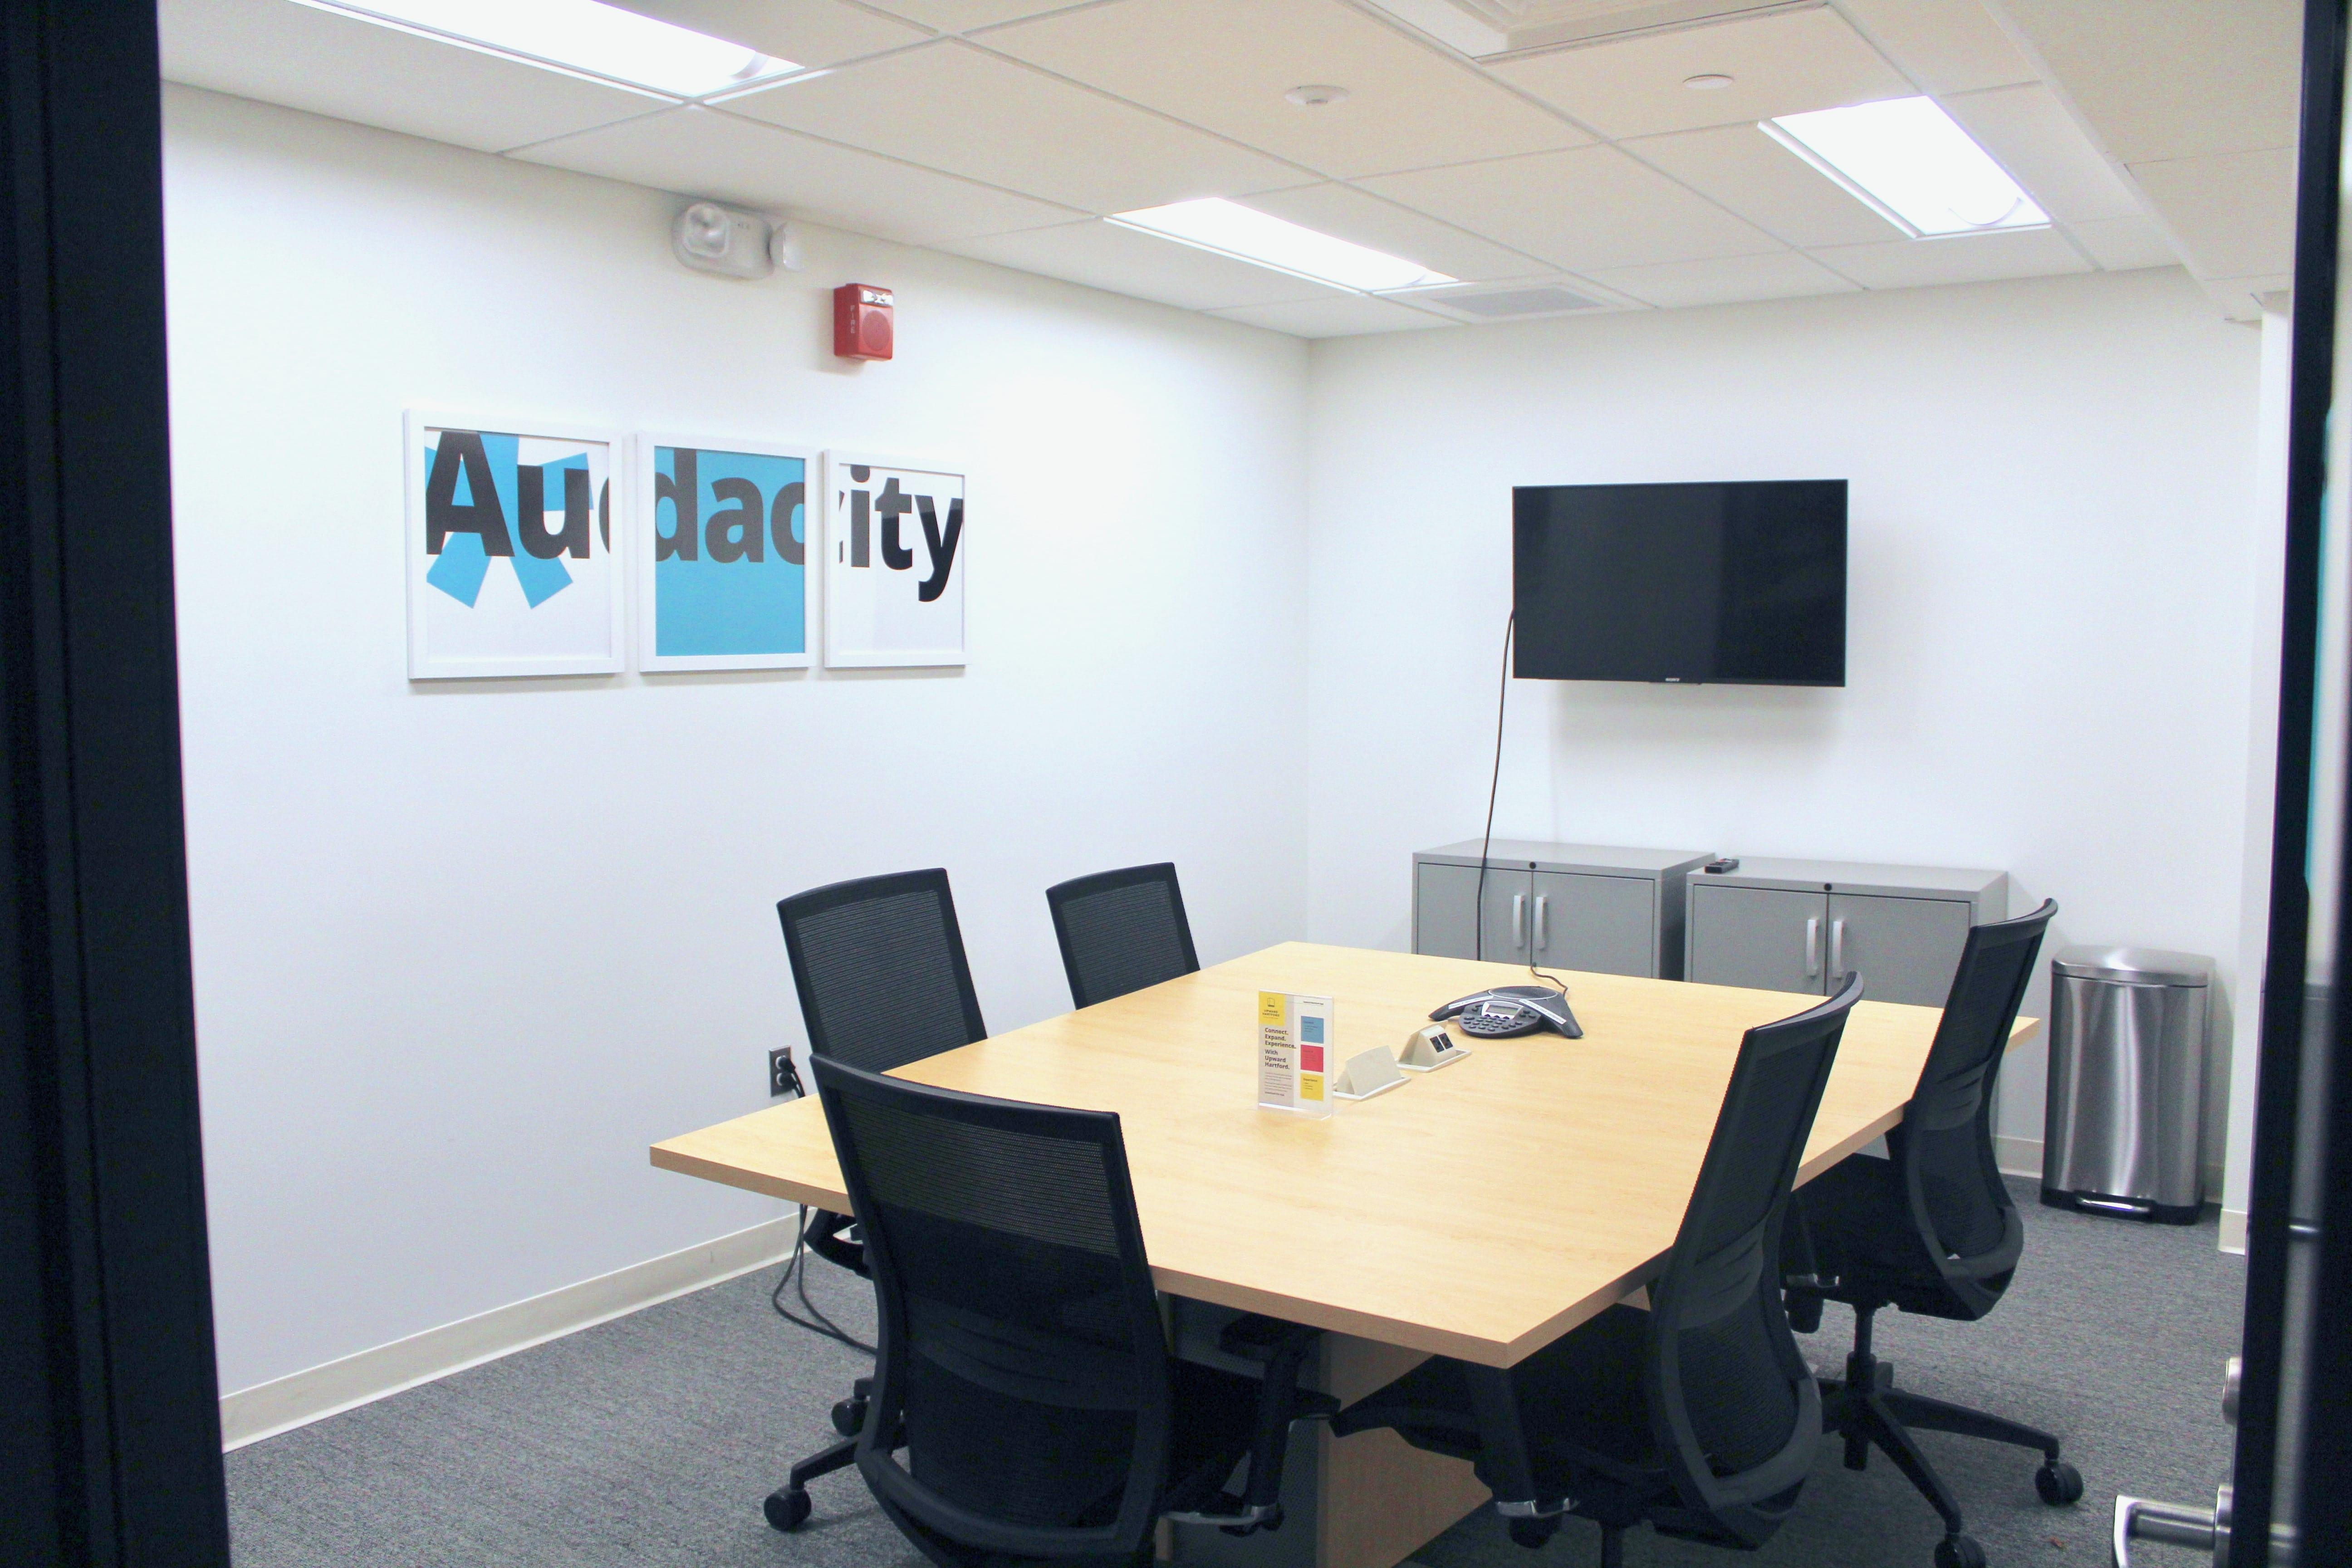 Upward Hartford - Audacity Conference Room